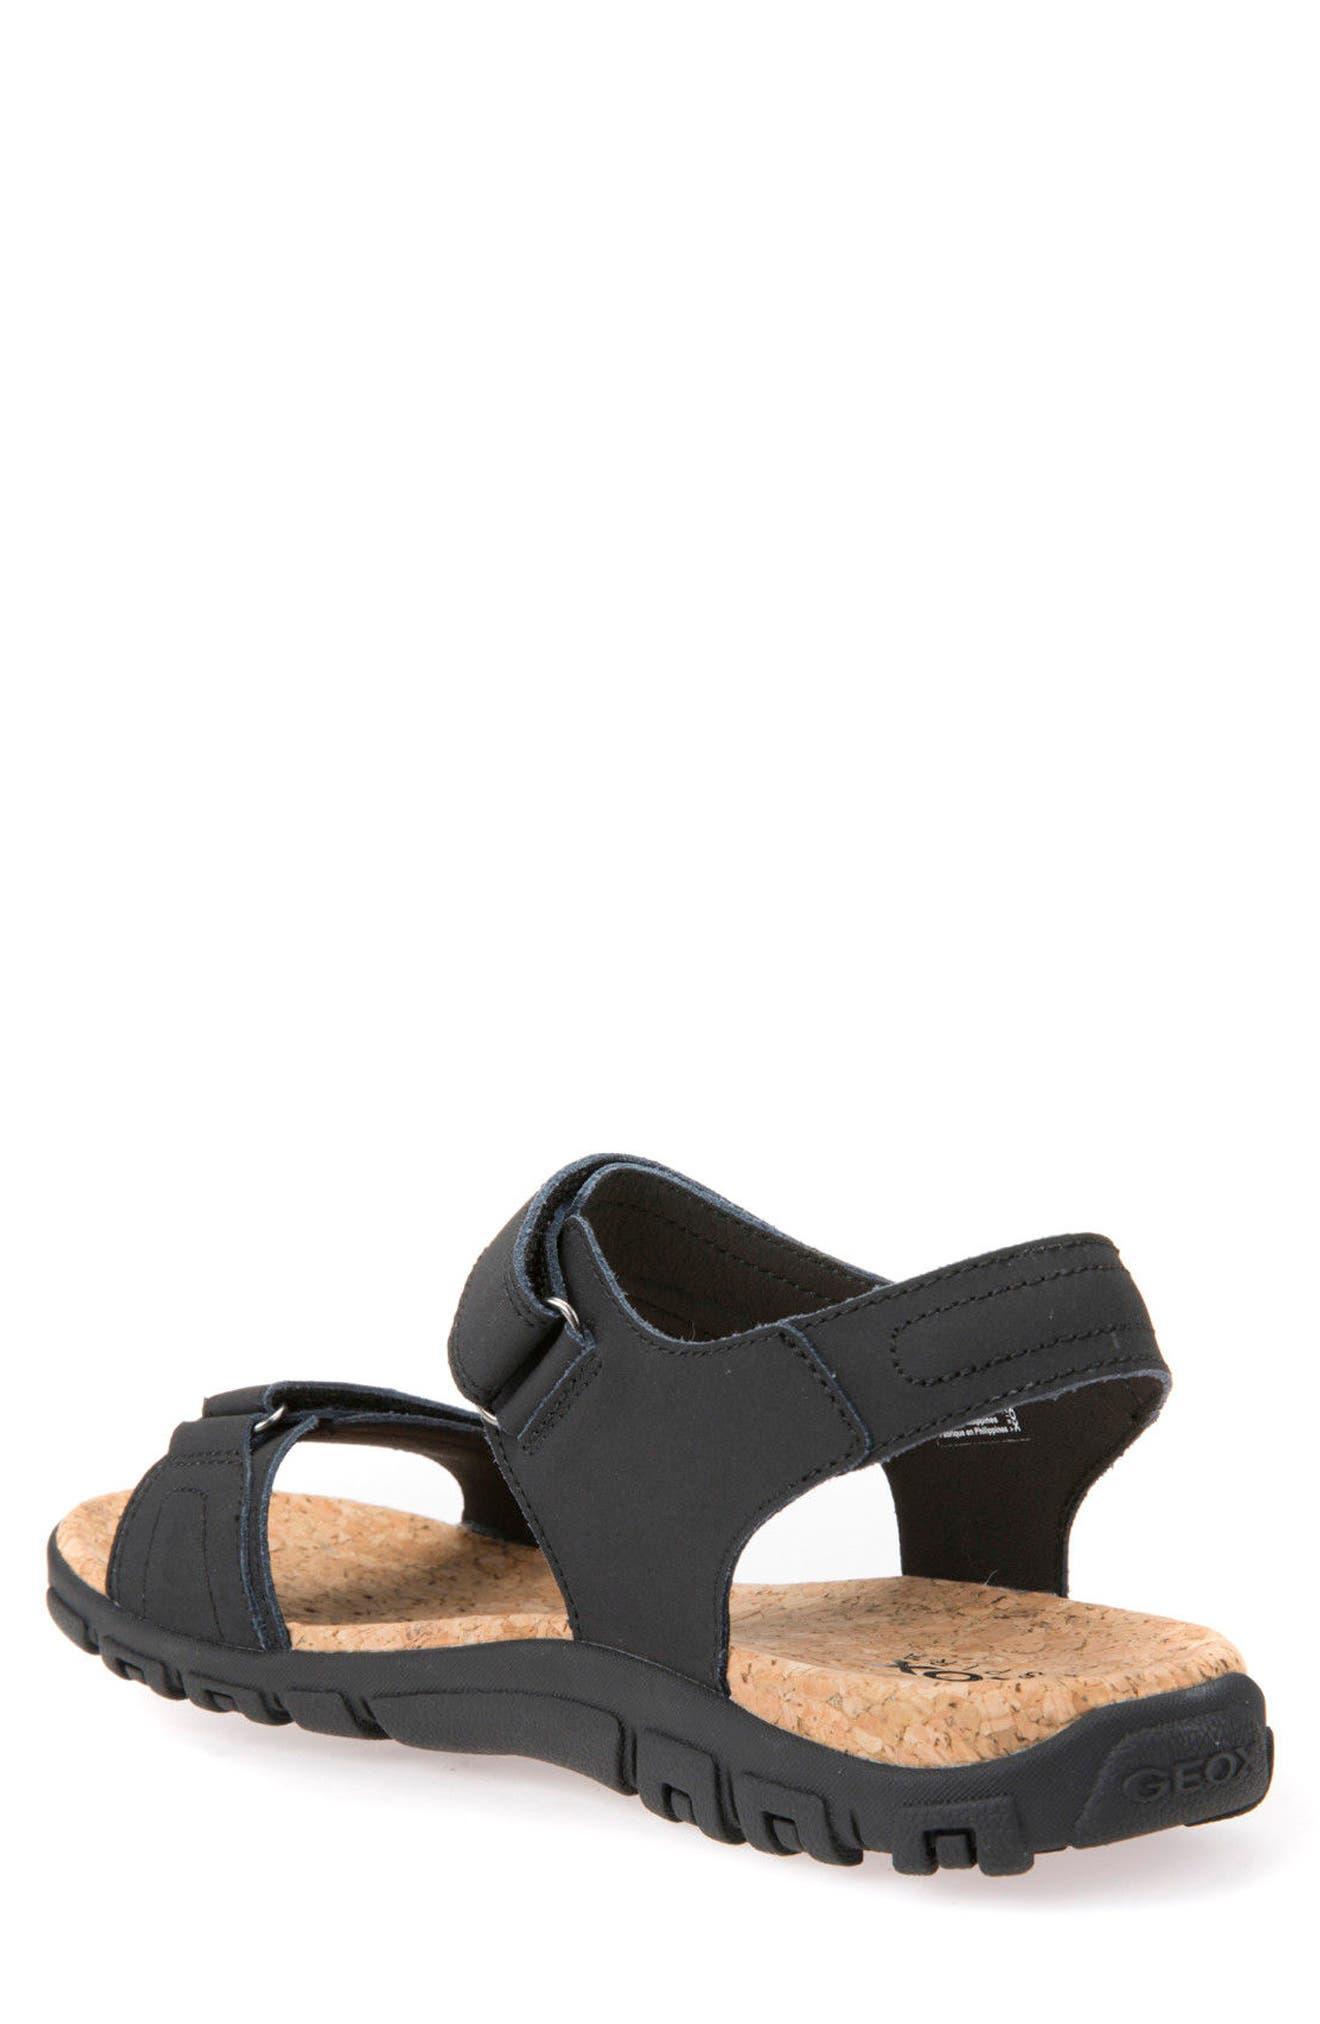 Strada 26 Sport Sandal,                             Alternate thumbnail 2, color,                             Black Leather